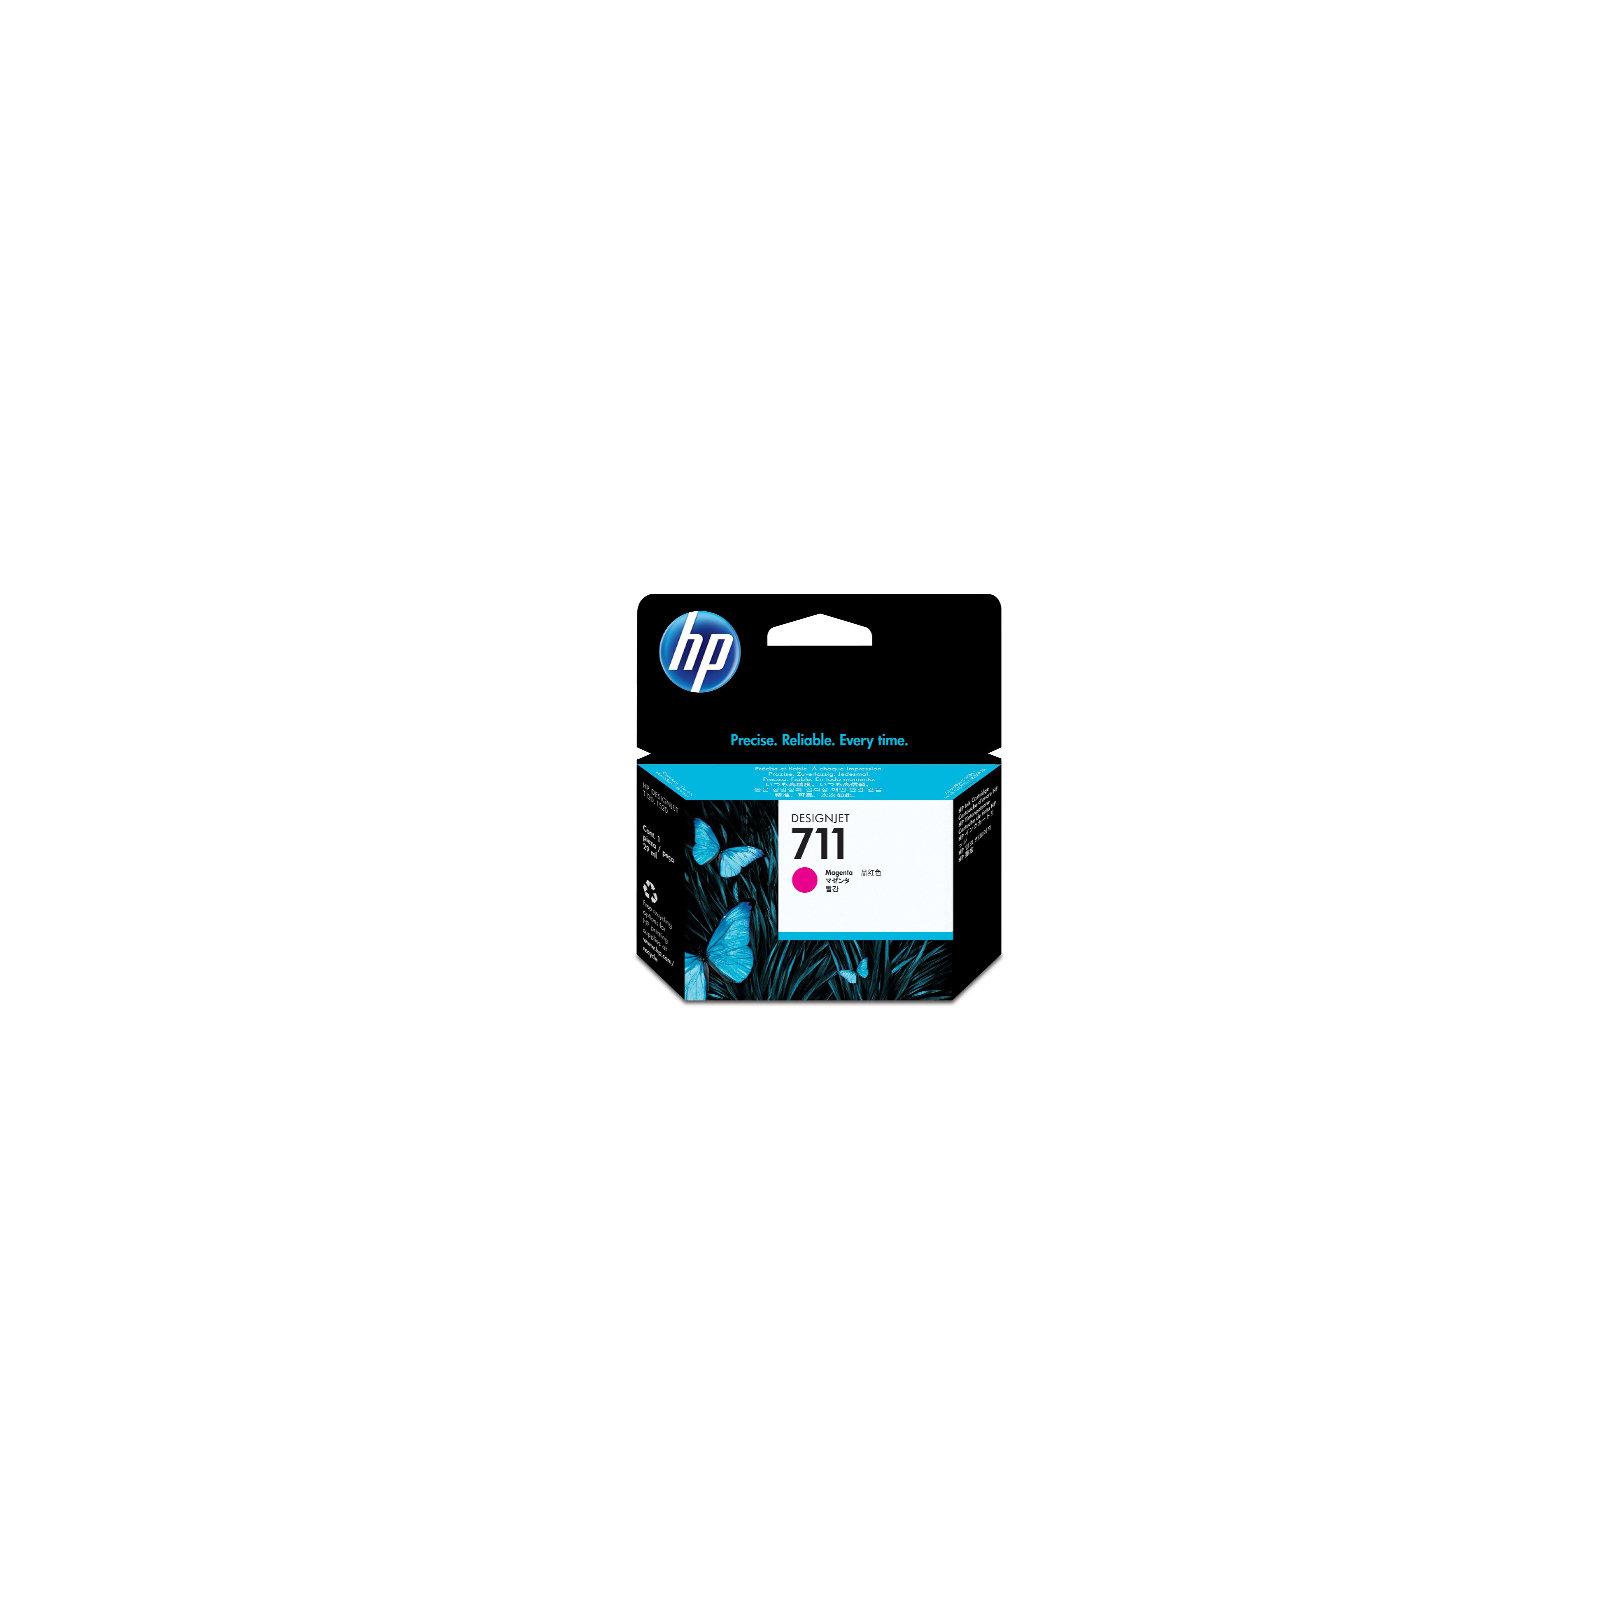 Картридж HP DJ No.711 3-Pack DesignJet 120/520 Magenta (CZ135A)